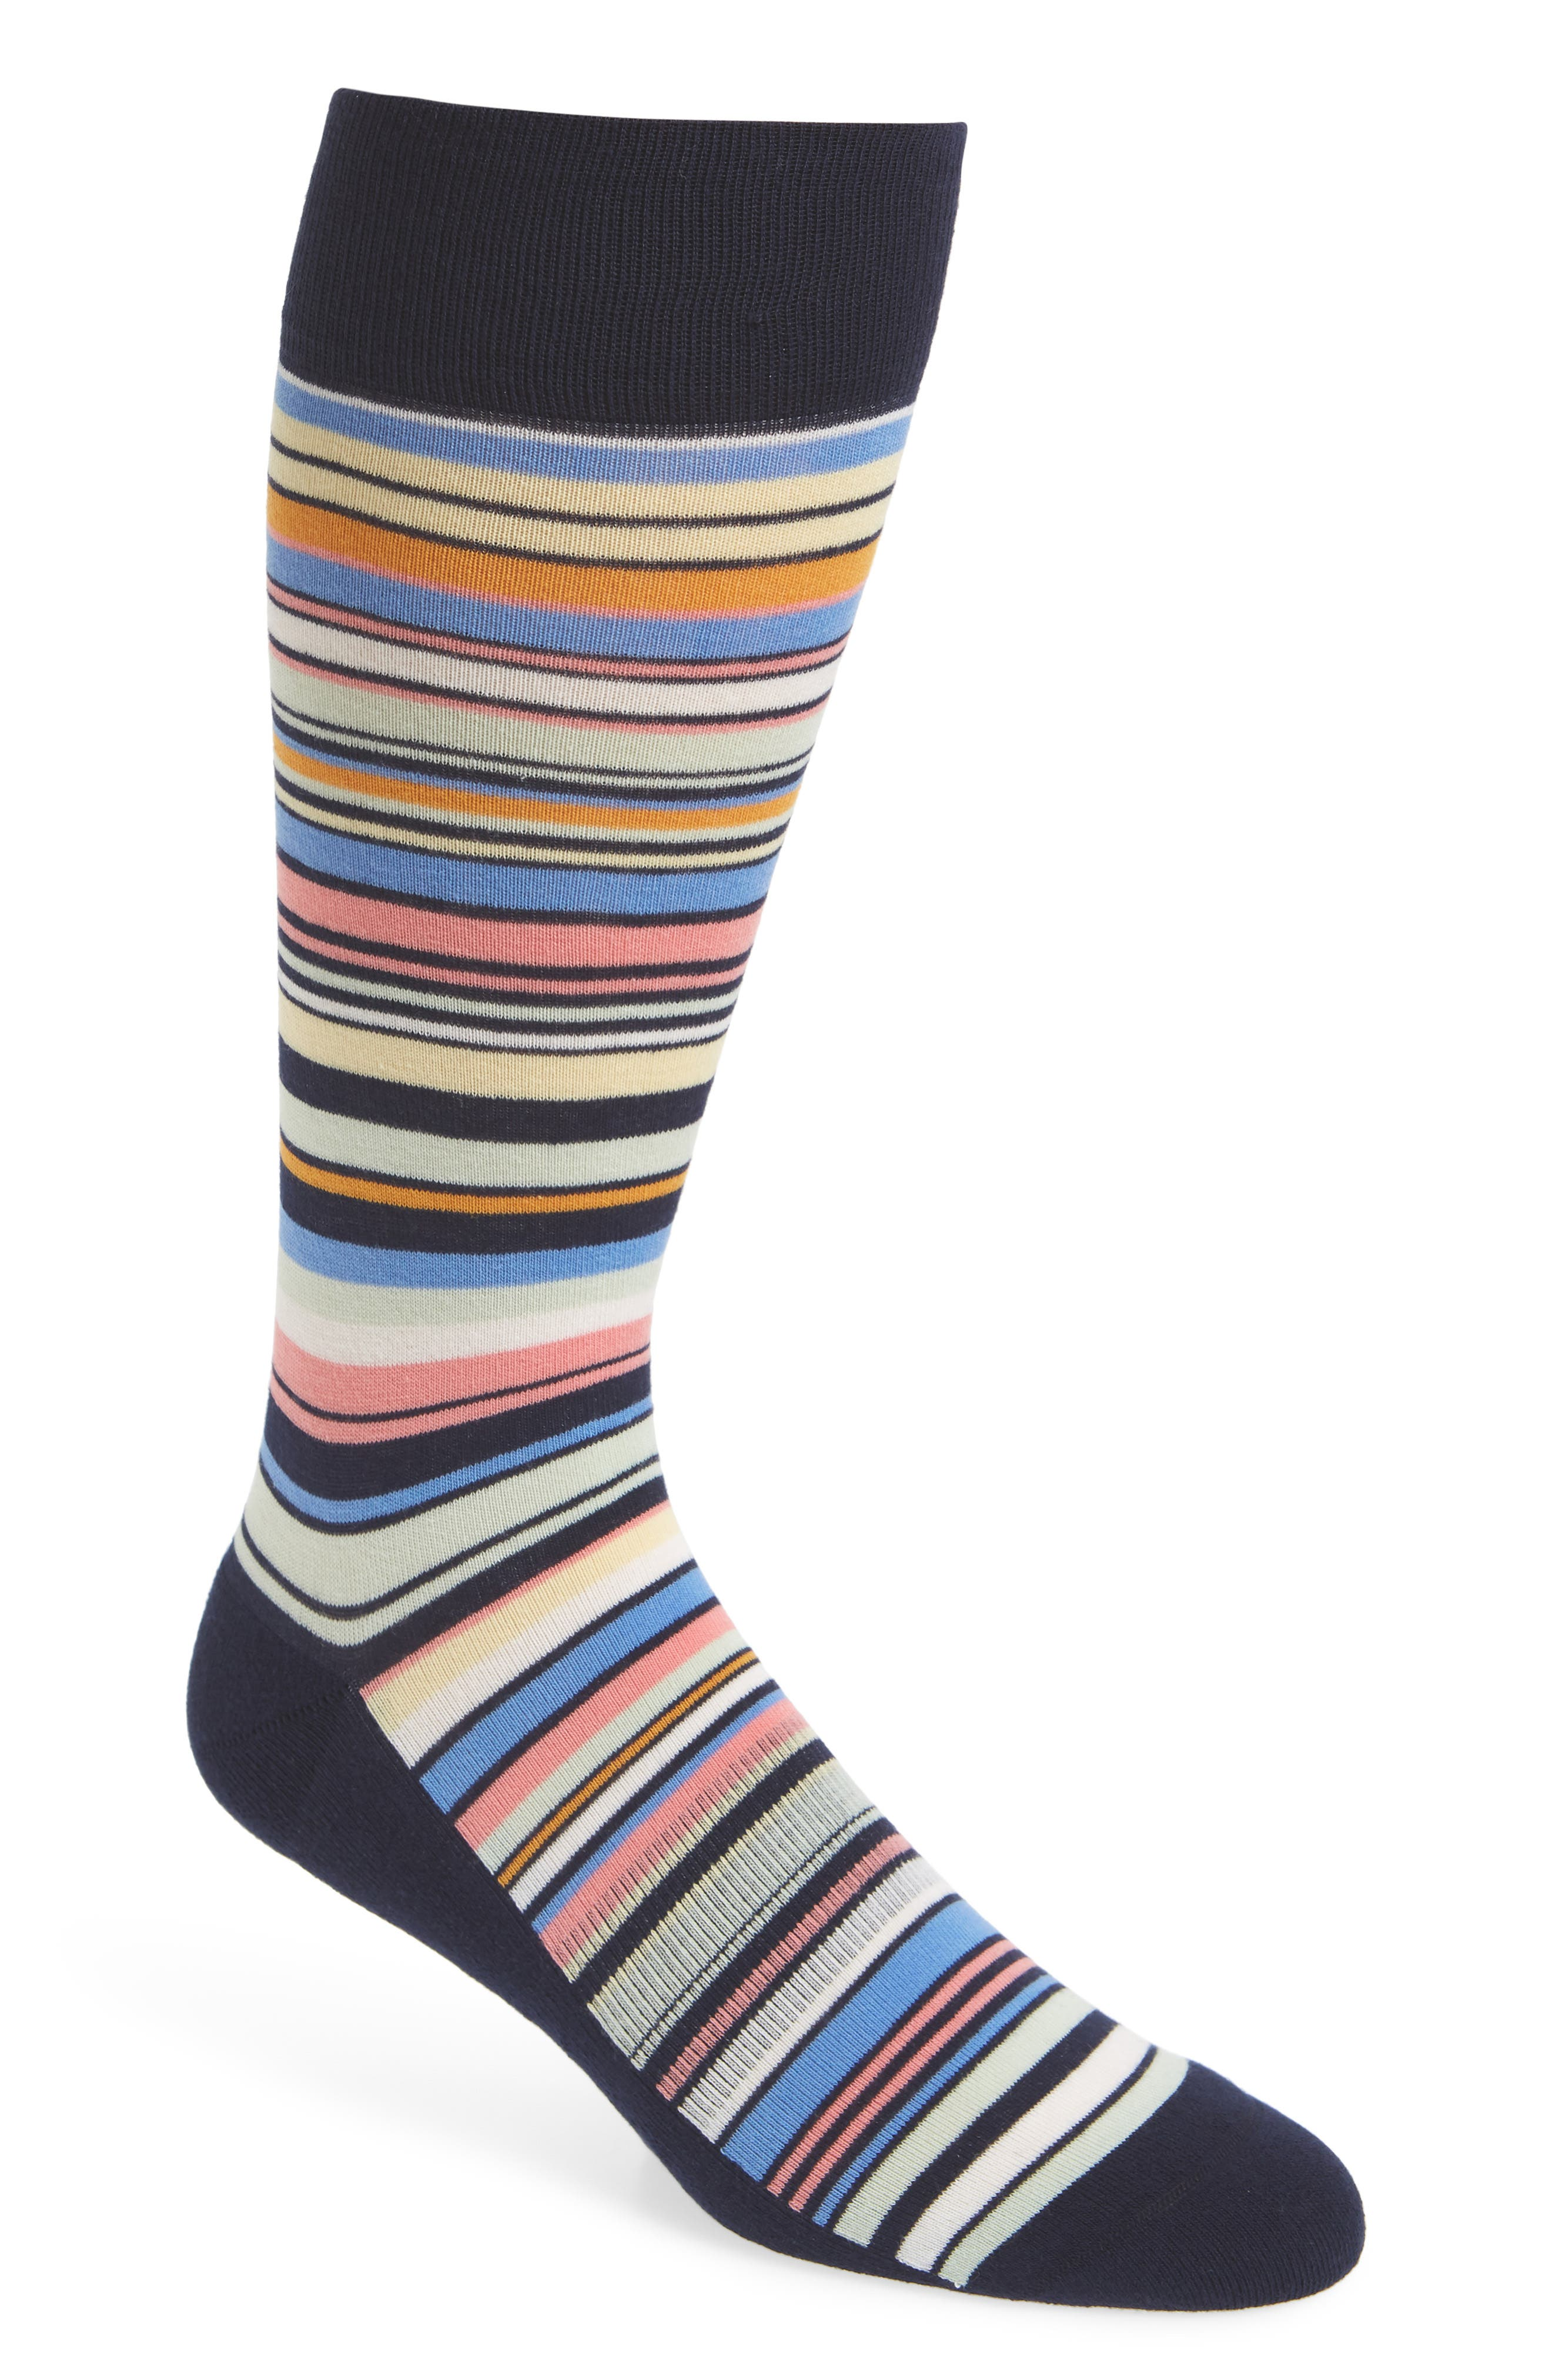 Stripe Socks,                         Main,                         color, Navy/ Pale Yellow